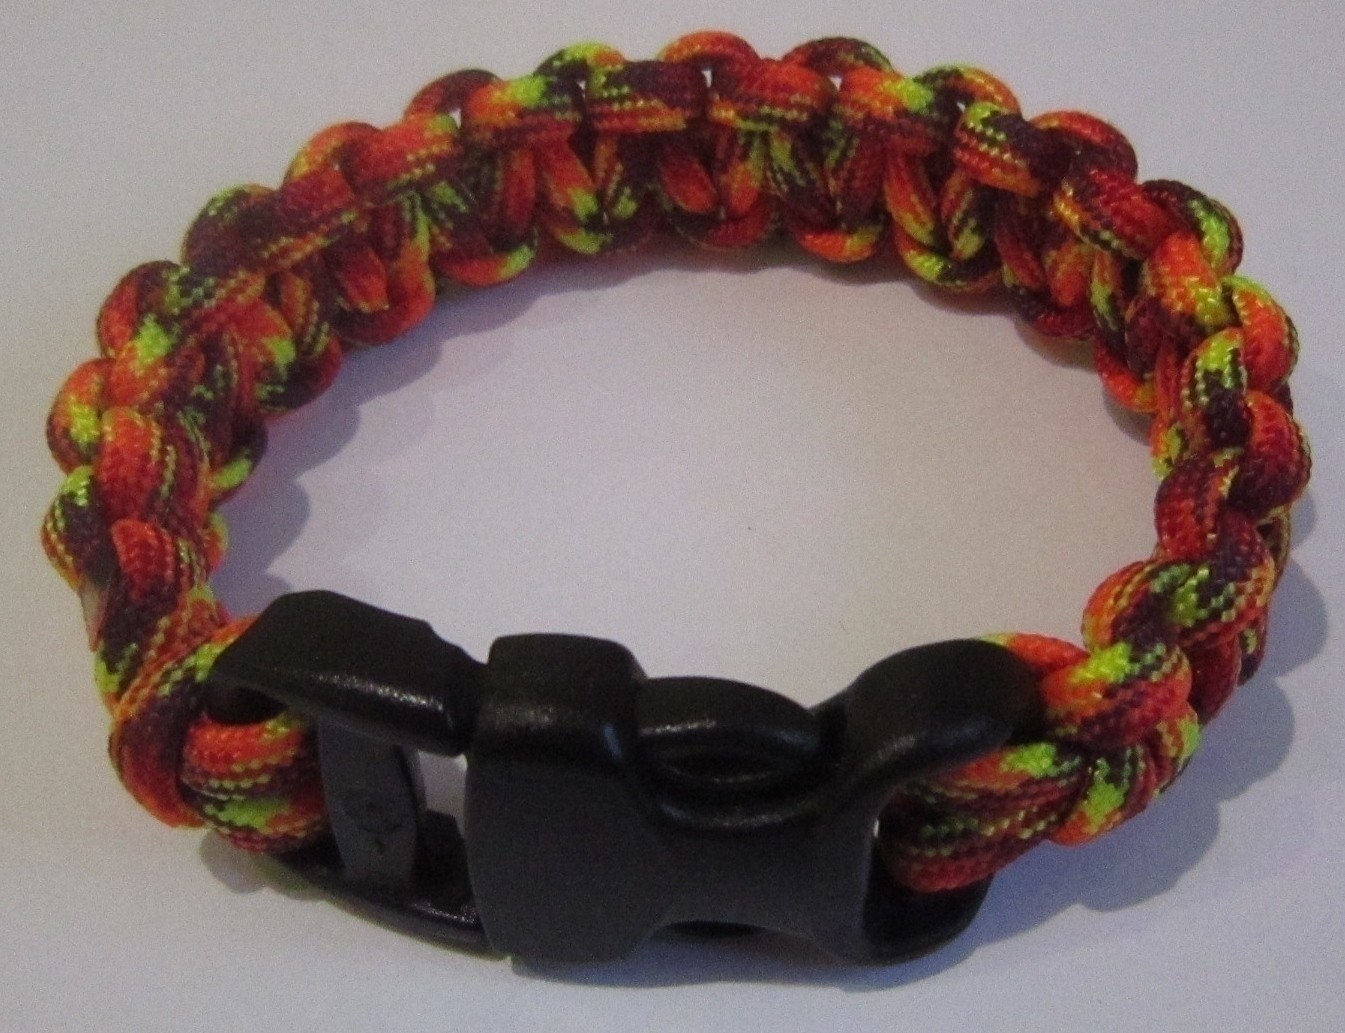 Paracord Bracelet A Braided Cord Bracelet Braiding And